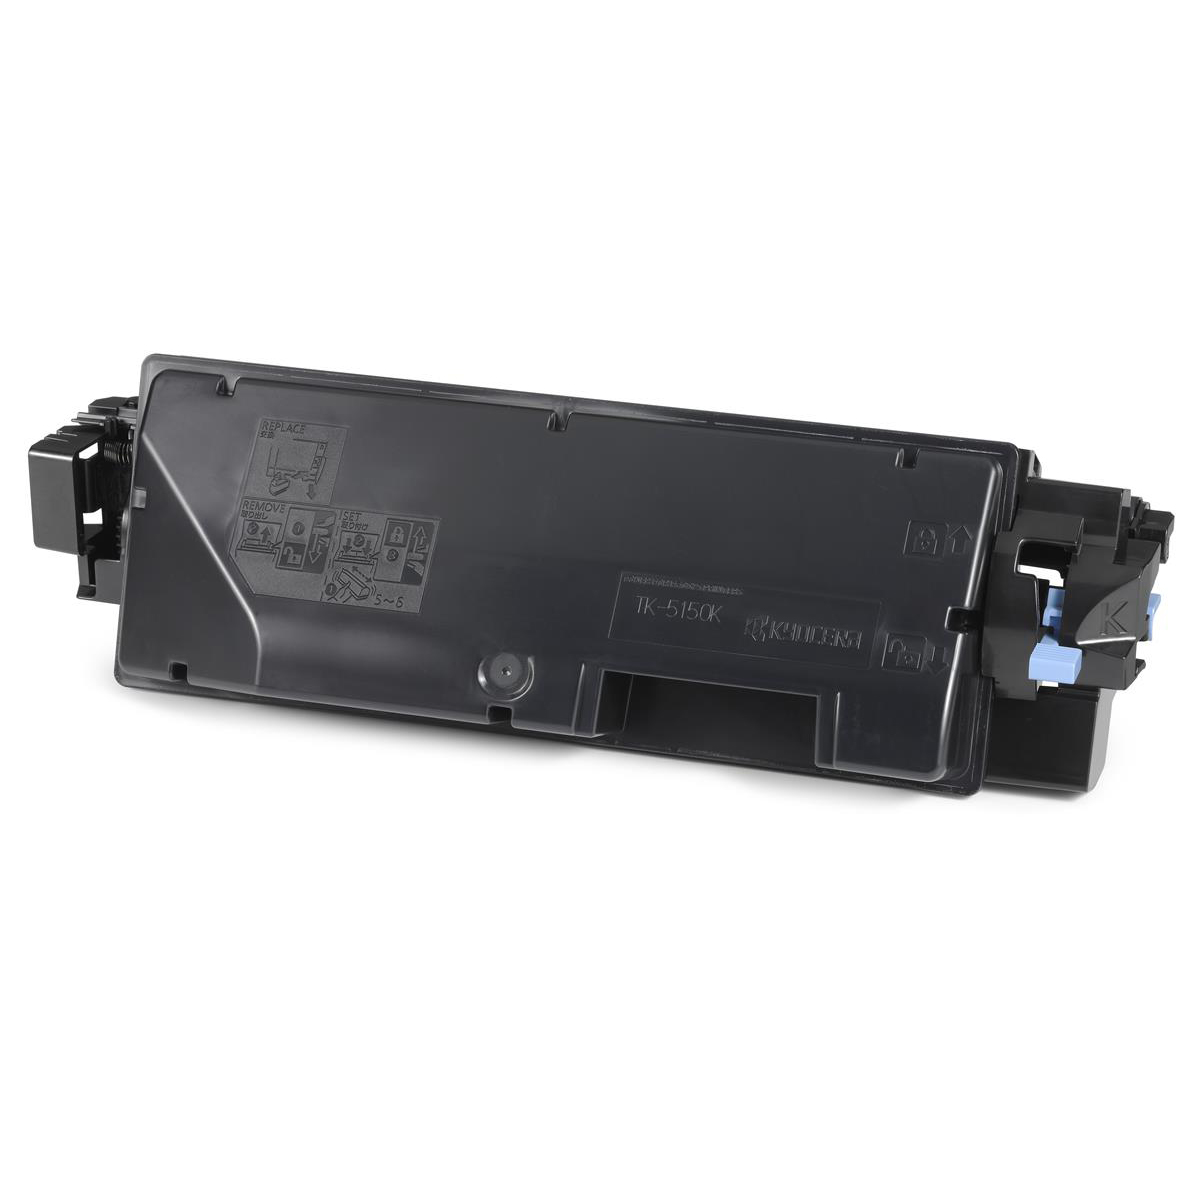 Kyocera TK-5150K Laser Toner Cartridge Page Life 12000pp Black Ref 1T02NS0NL0 3to5 Day Leadtime